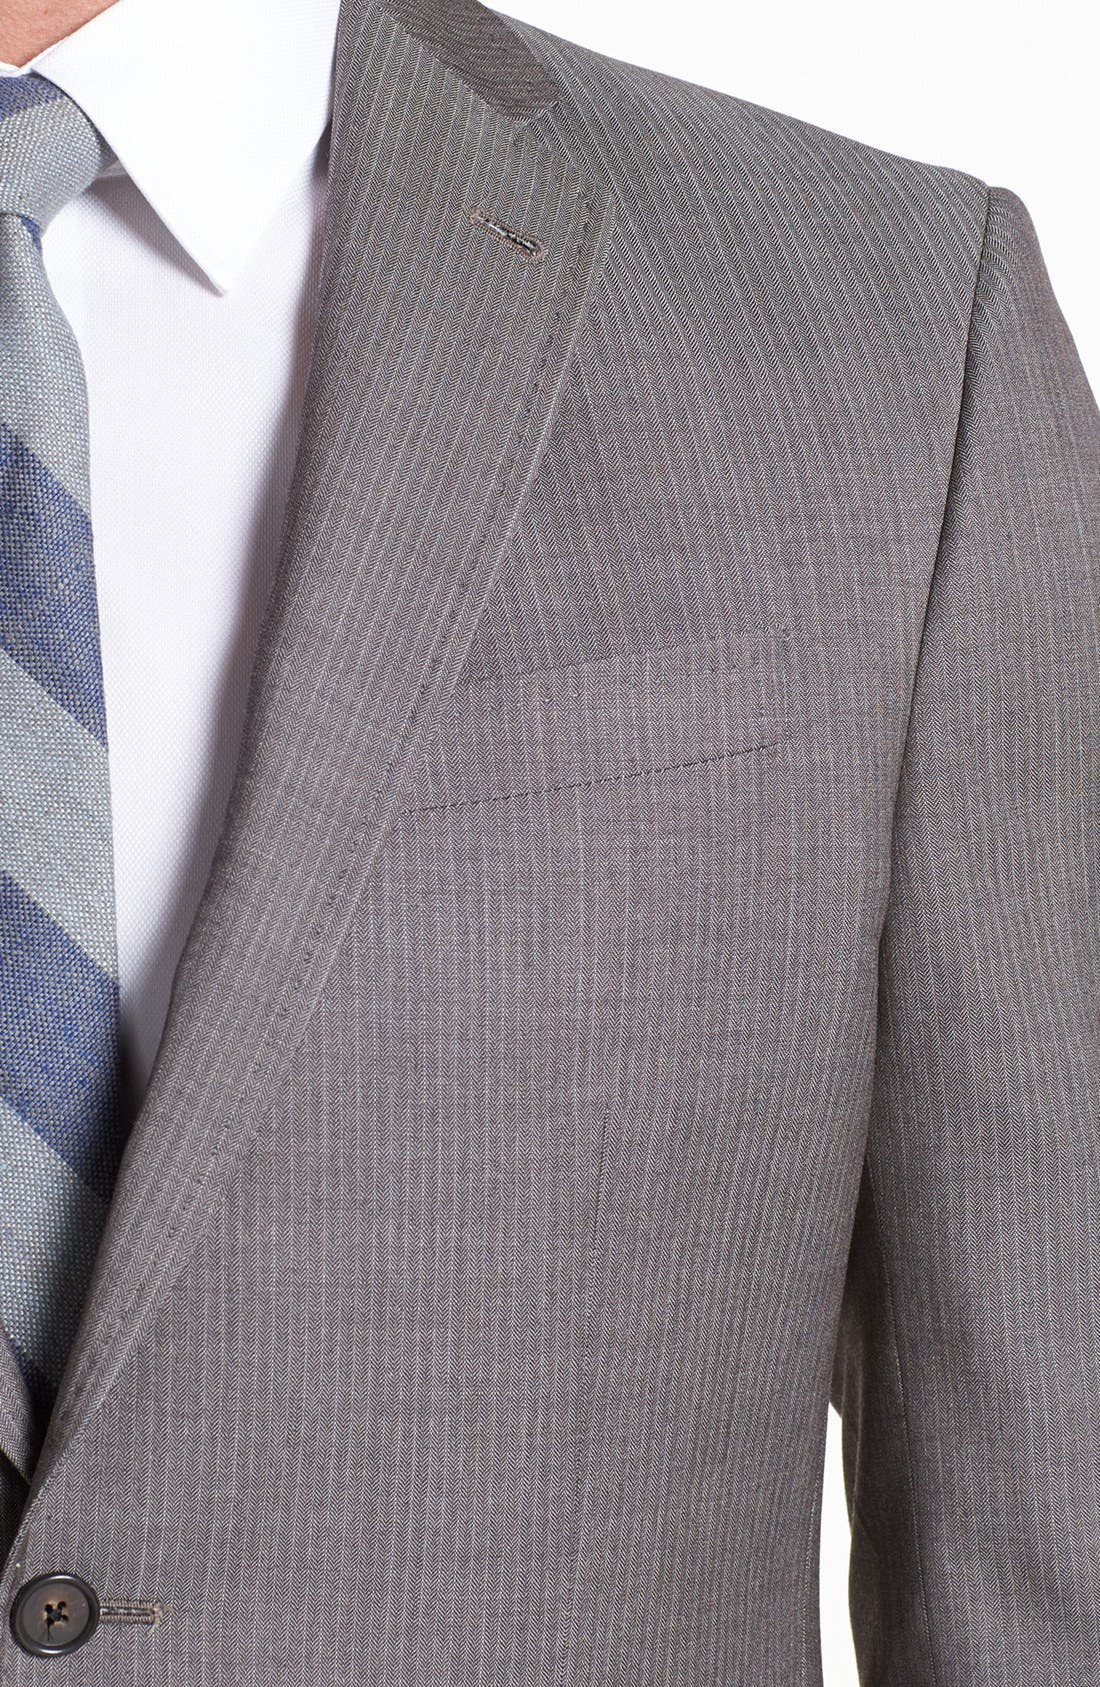 Alternate Image 2  - Ted Baker London 'Jim' Tan Herringbone Wool Suit